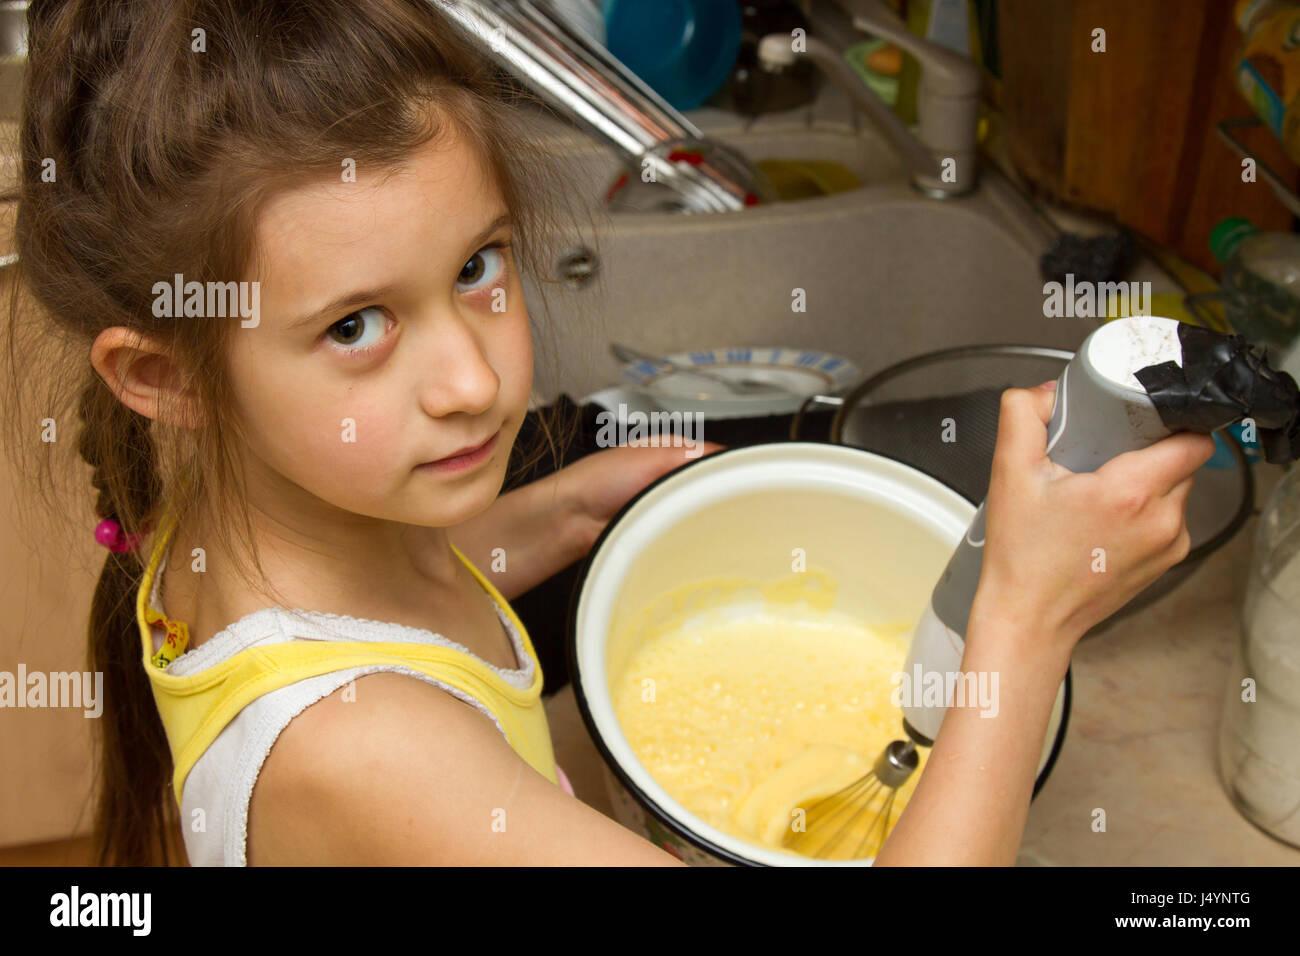 Child preparing cookies in kitchen. - Stock Image